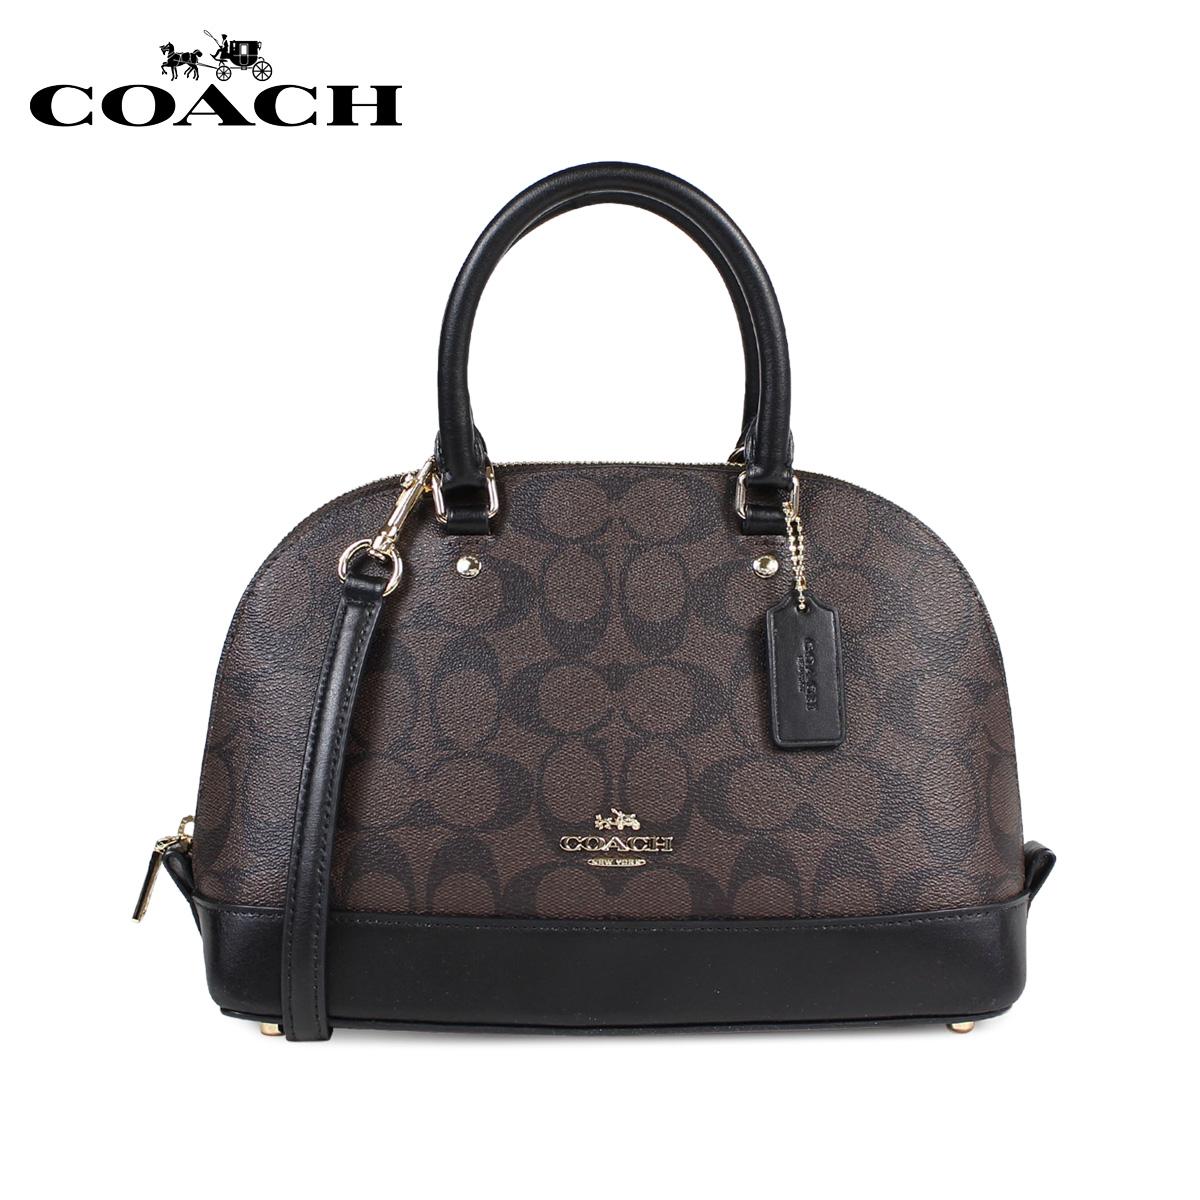 dd95bc2b2 COACH coach bag shoulder bag Lady's MINI SIERRA SATCHEL IN SIGNATURE COATED  CANVAS F59295 brown ...